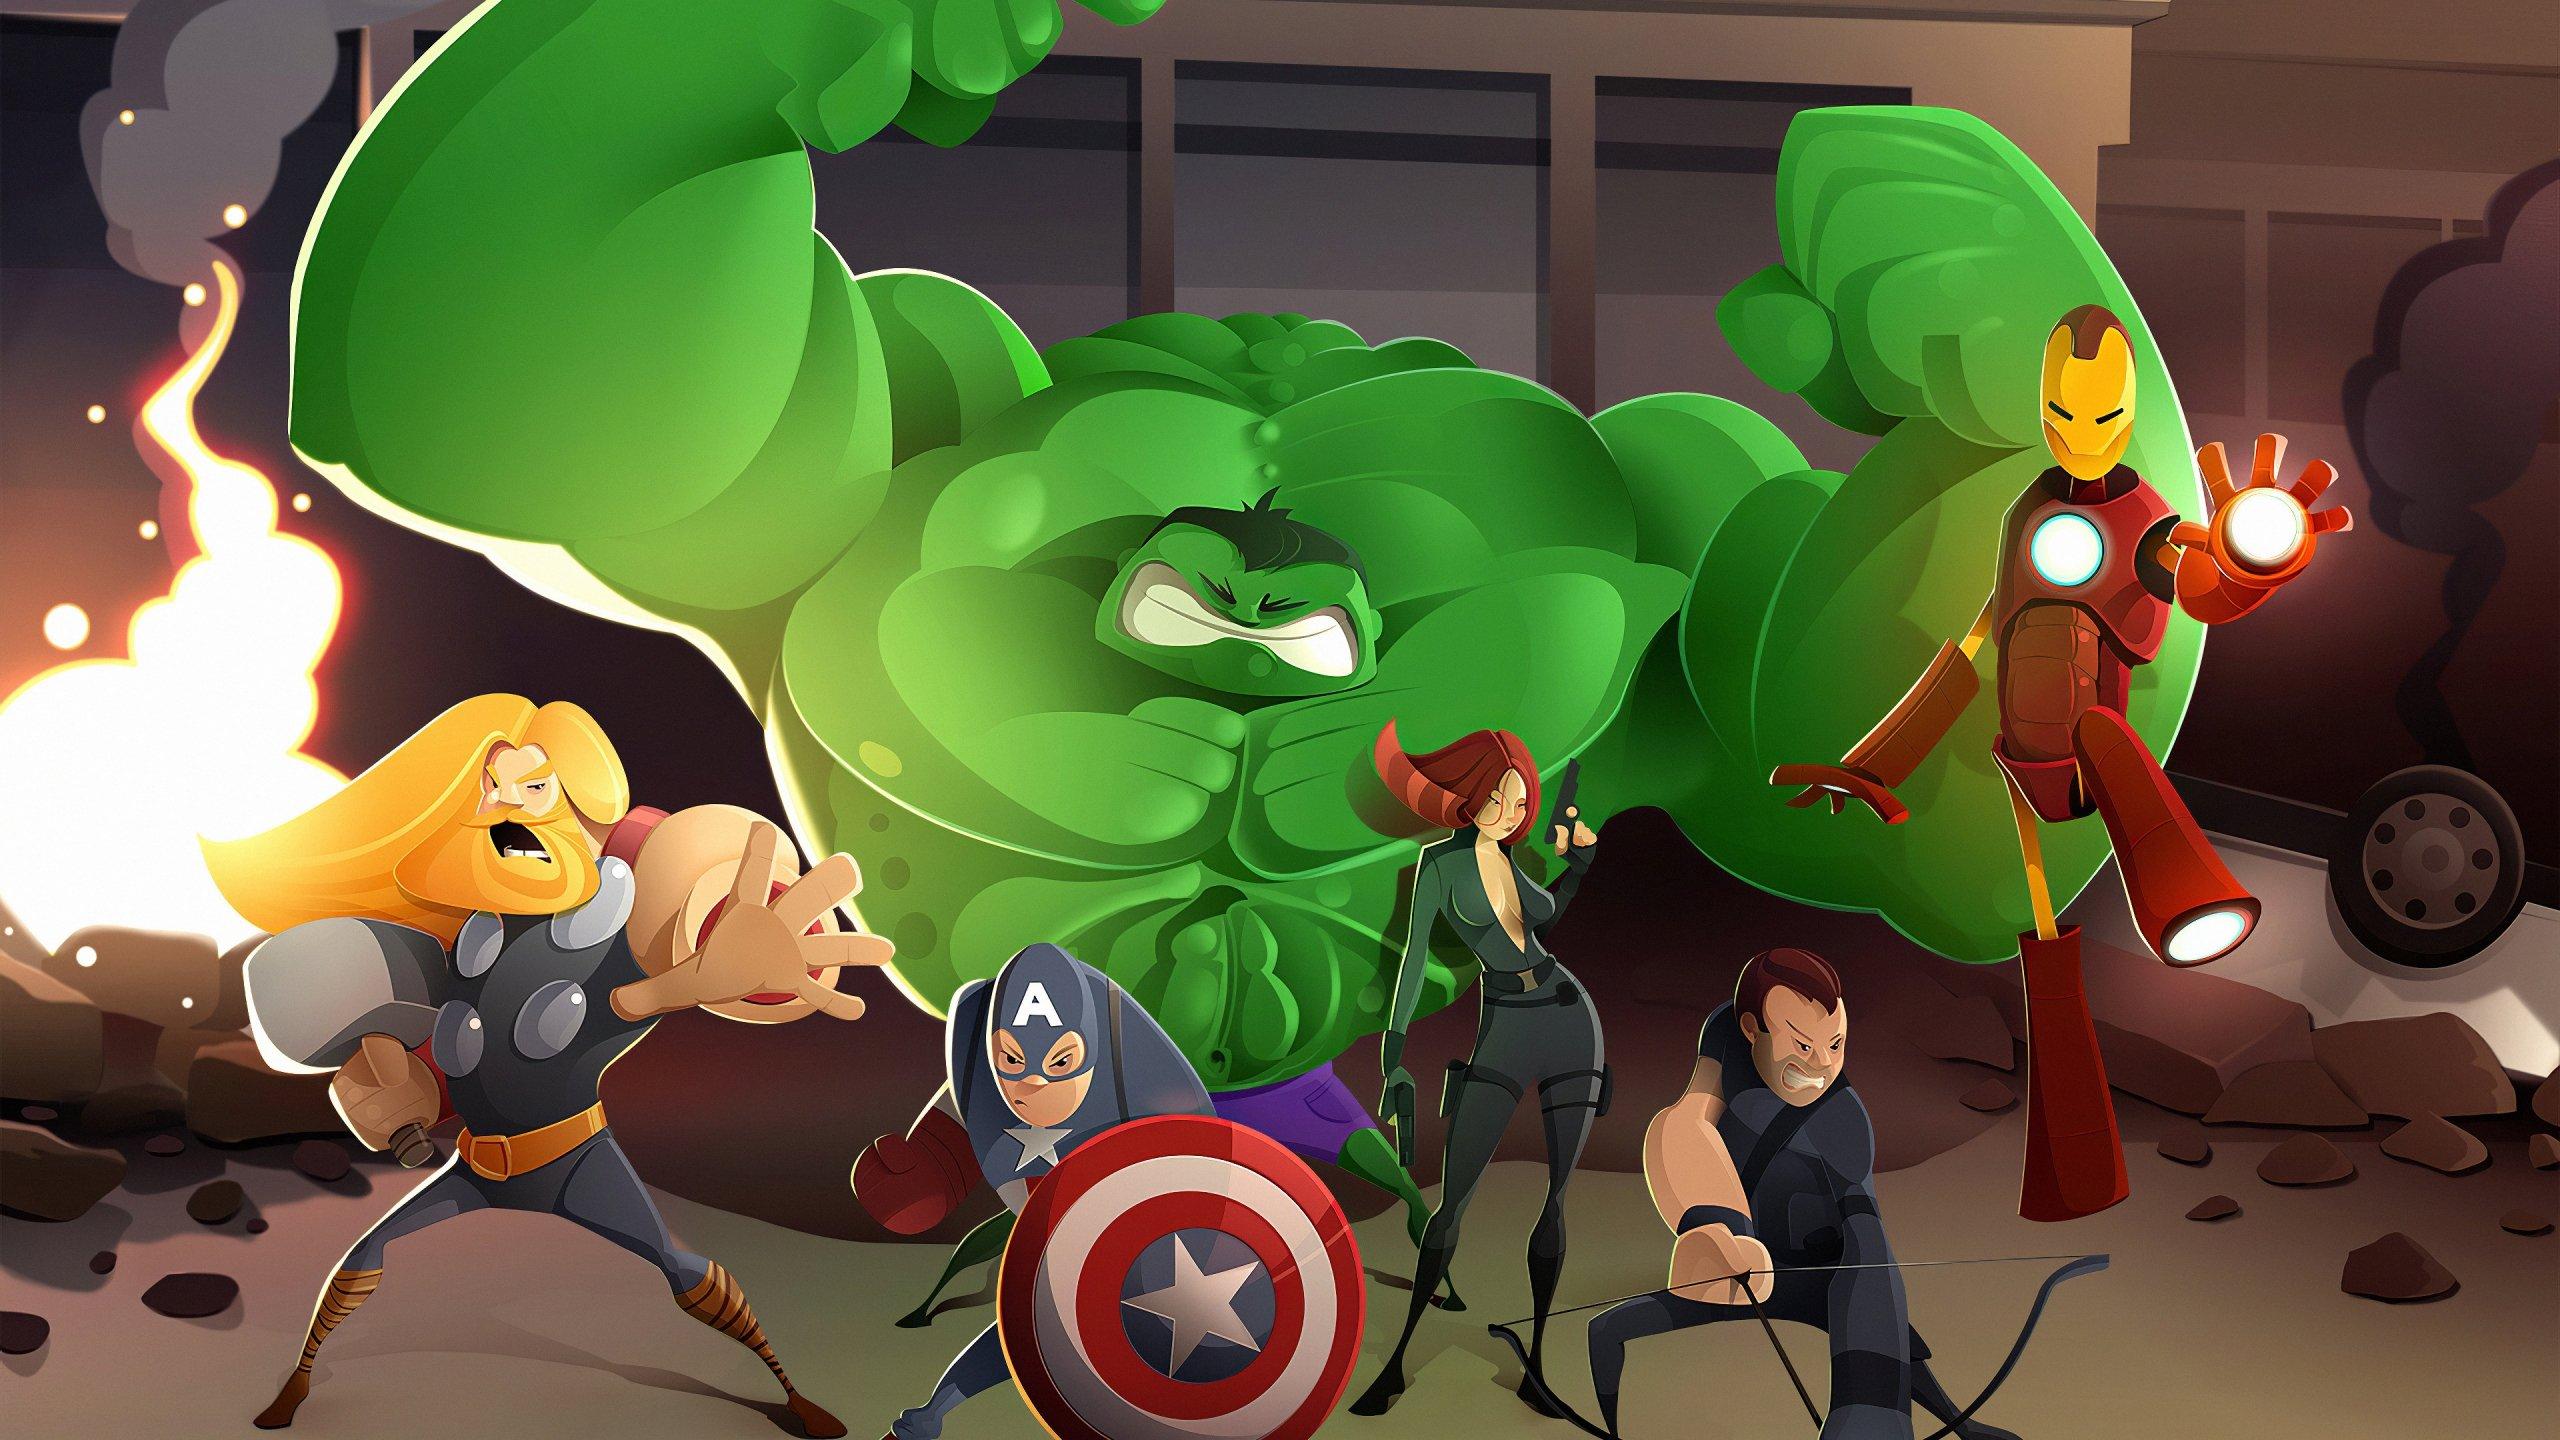 Cartoon Of The Avengers Wallpaper 4k Ultra Hd Id 4525